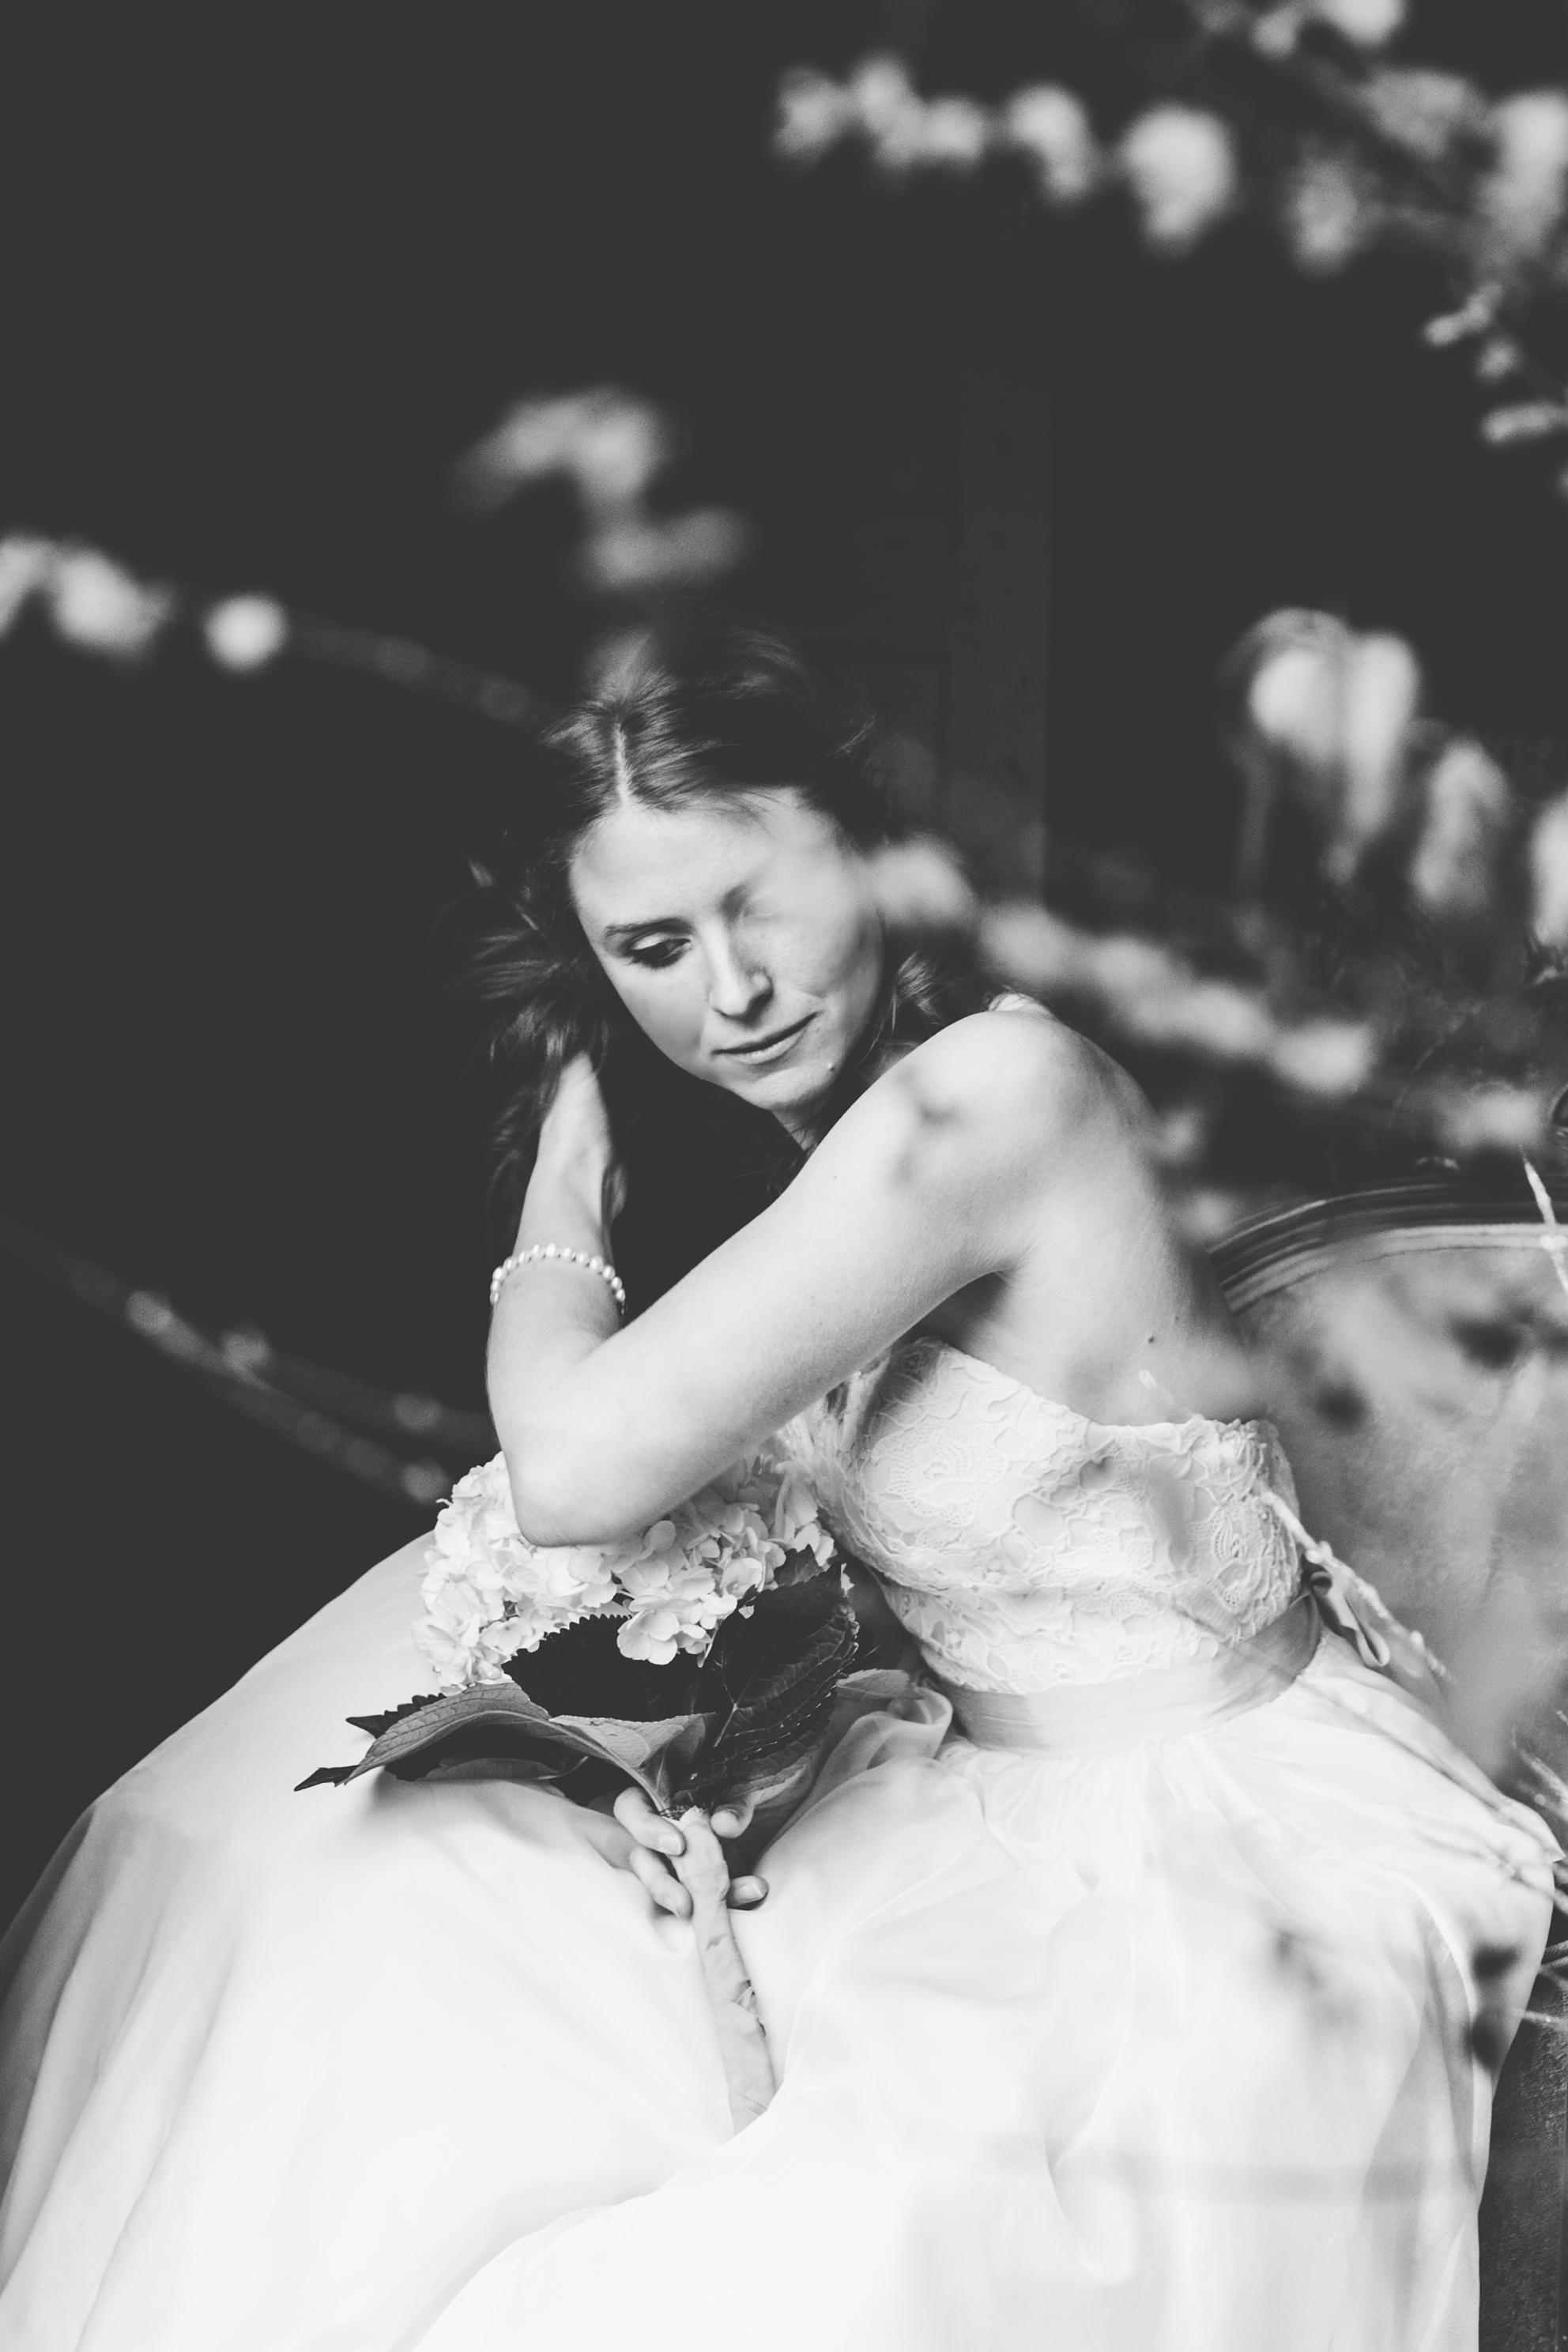 Jake + Brittney Balbas Airbnb Carriage House Wedding Evansville IN (135 of 426).jpg